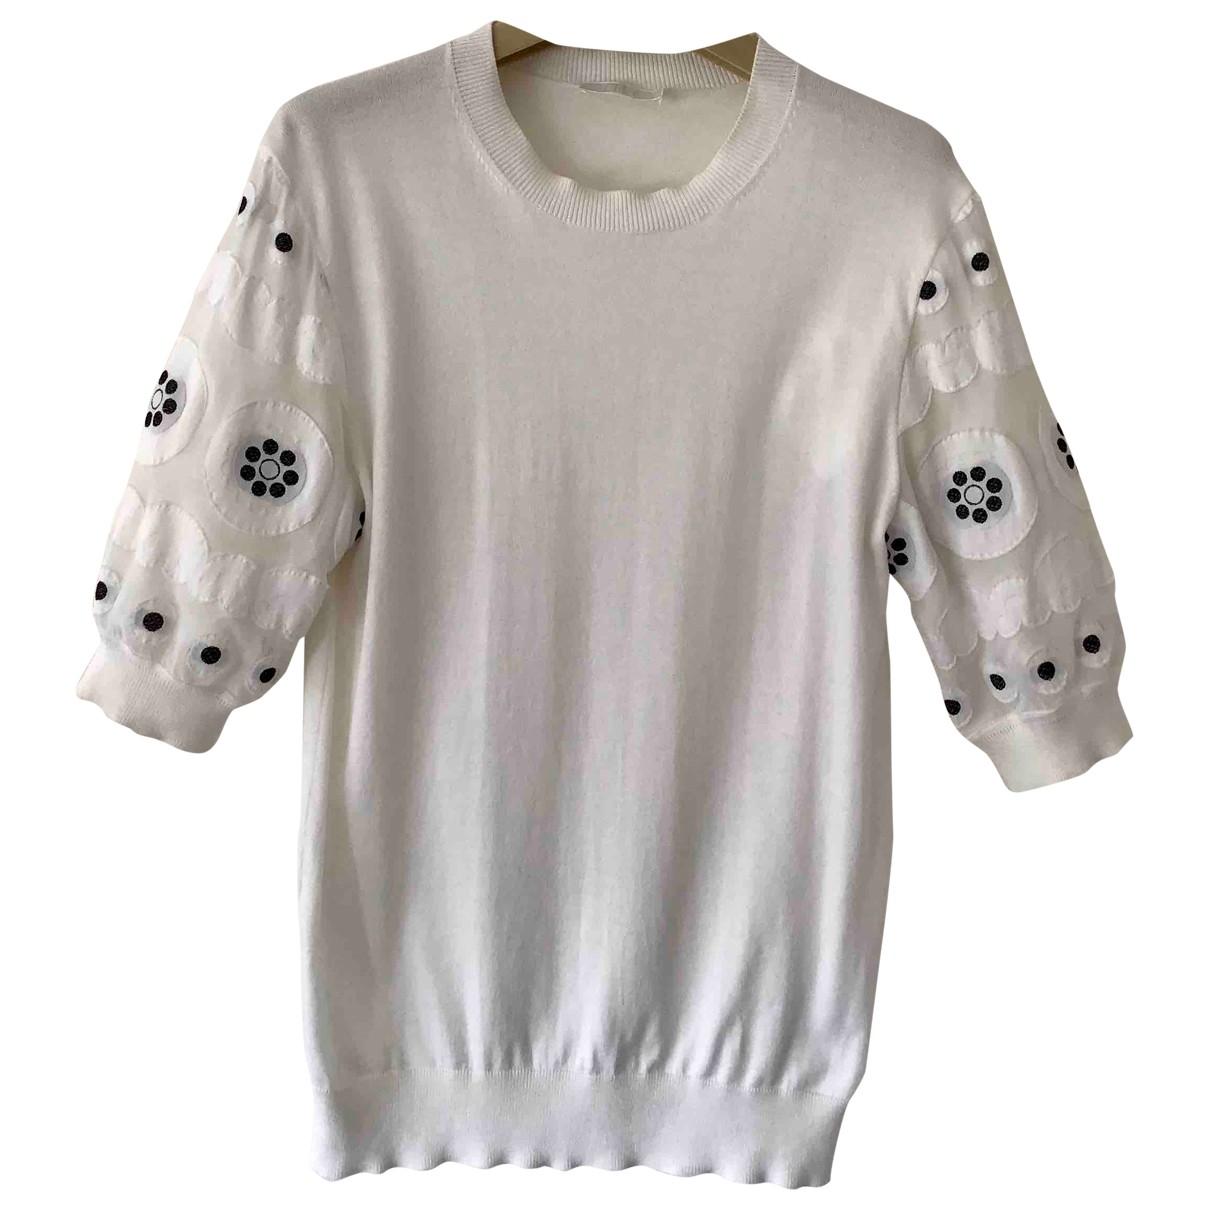 Chloé \N Beige Cotton  top for Women S International